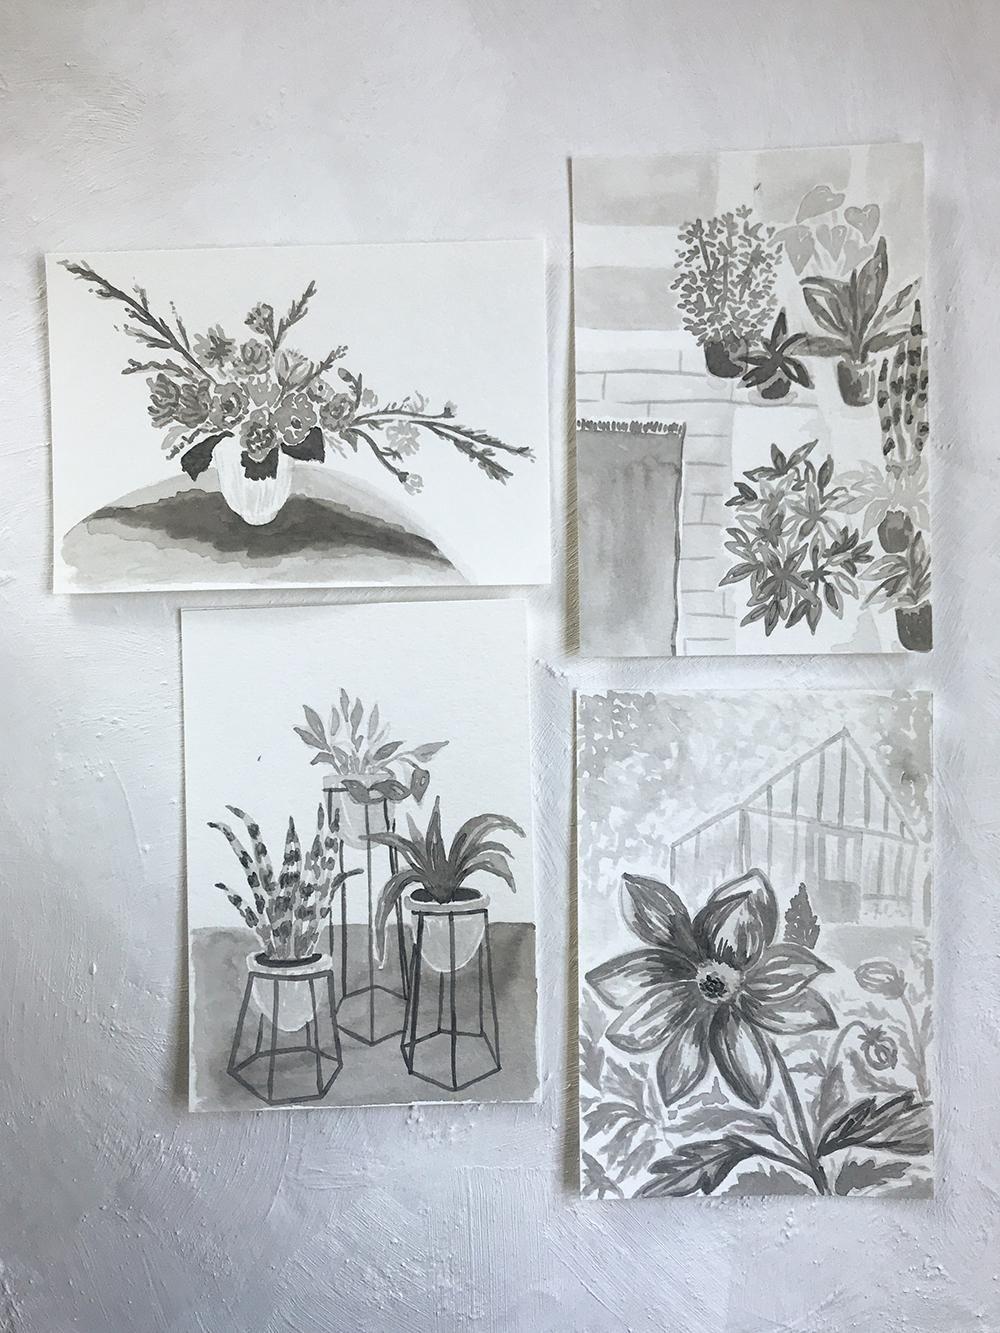 Birmingham Plant Stores - image 6 - student project